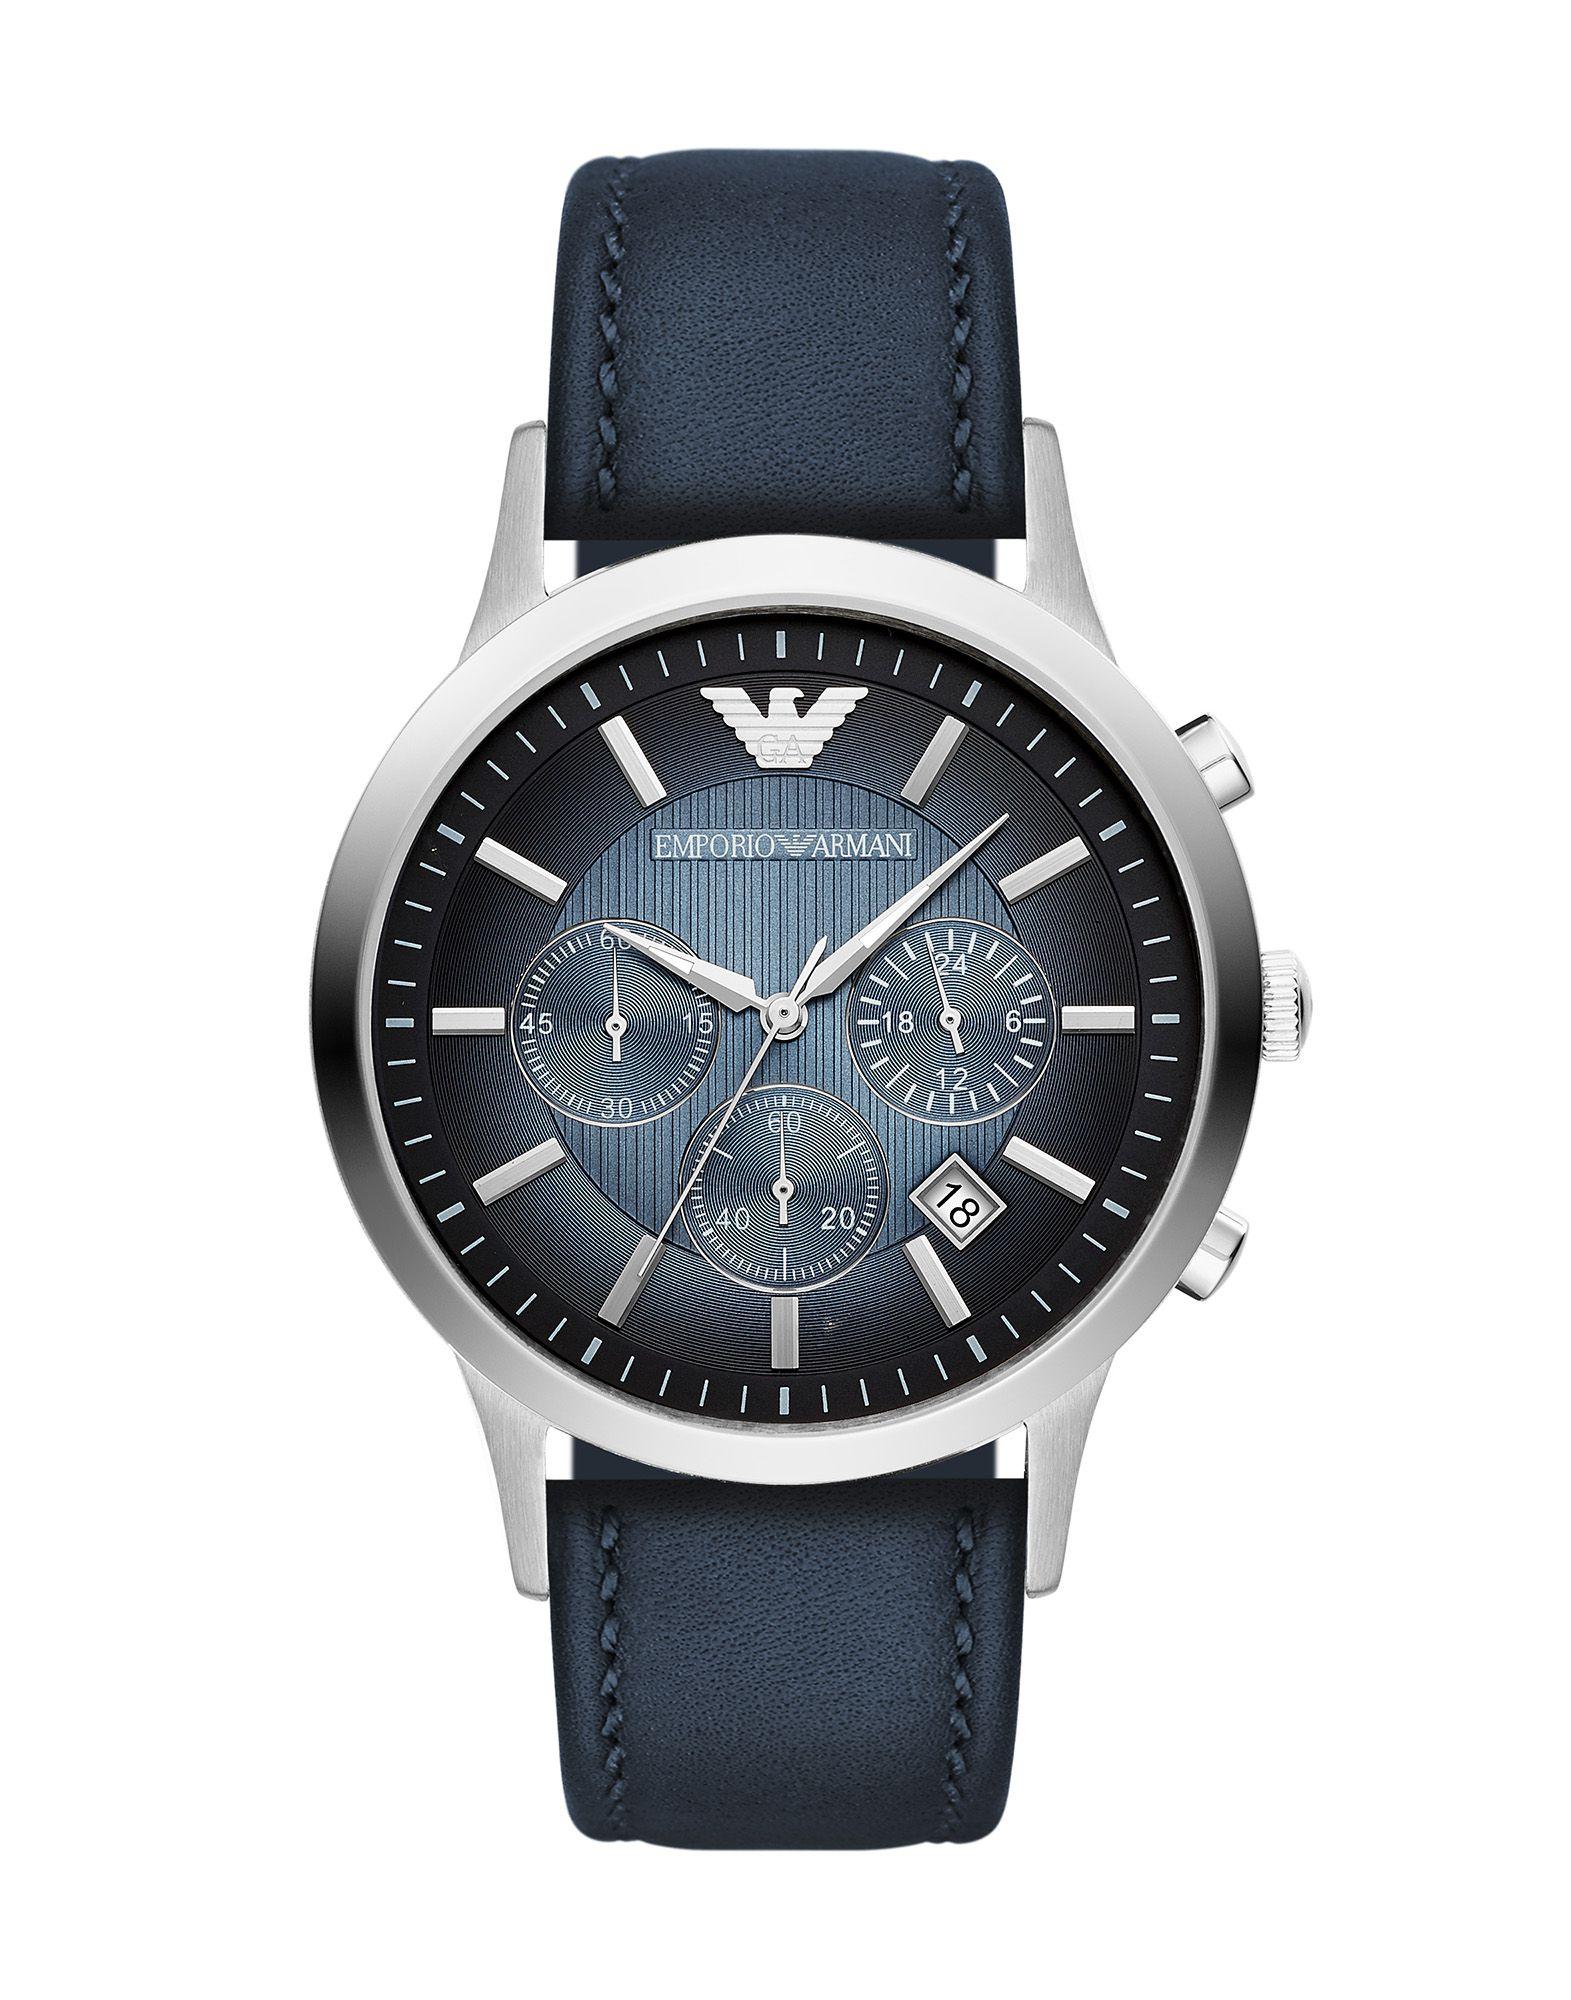 EMPORIO ARMANI Наручные часы наручные часы emporio armani ar11274